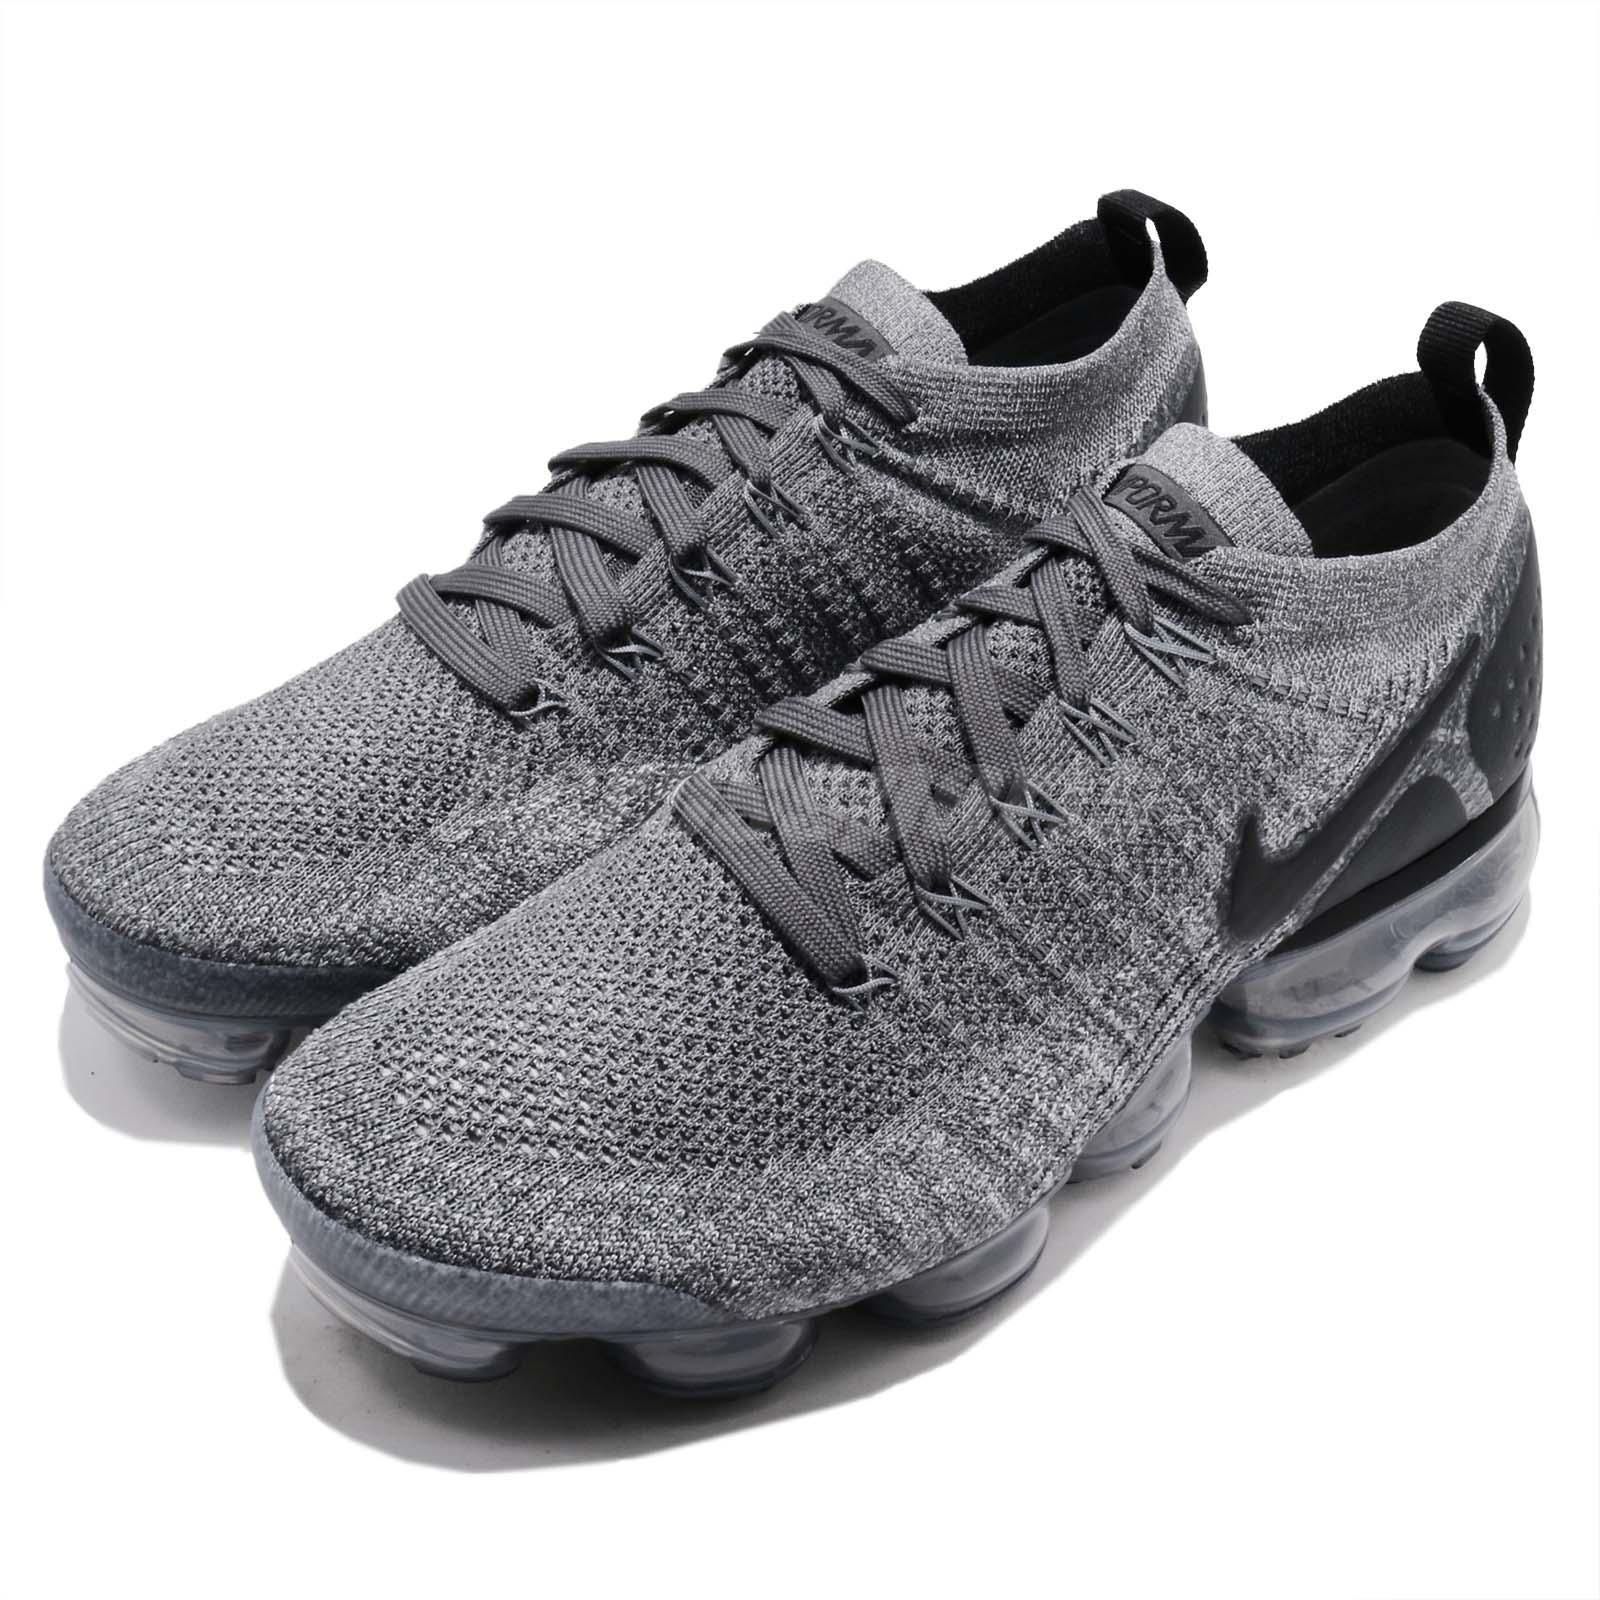 cc1ebee3219 Details about Nike Air Vapormax Flyknit 2 II Dark Grey Men Running Shoes  Sneakers 942842-002